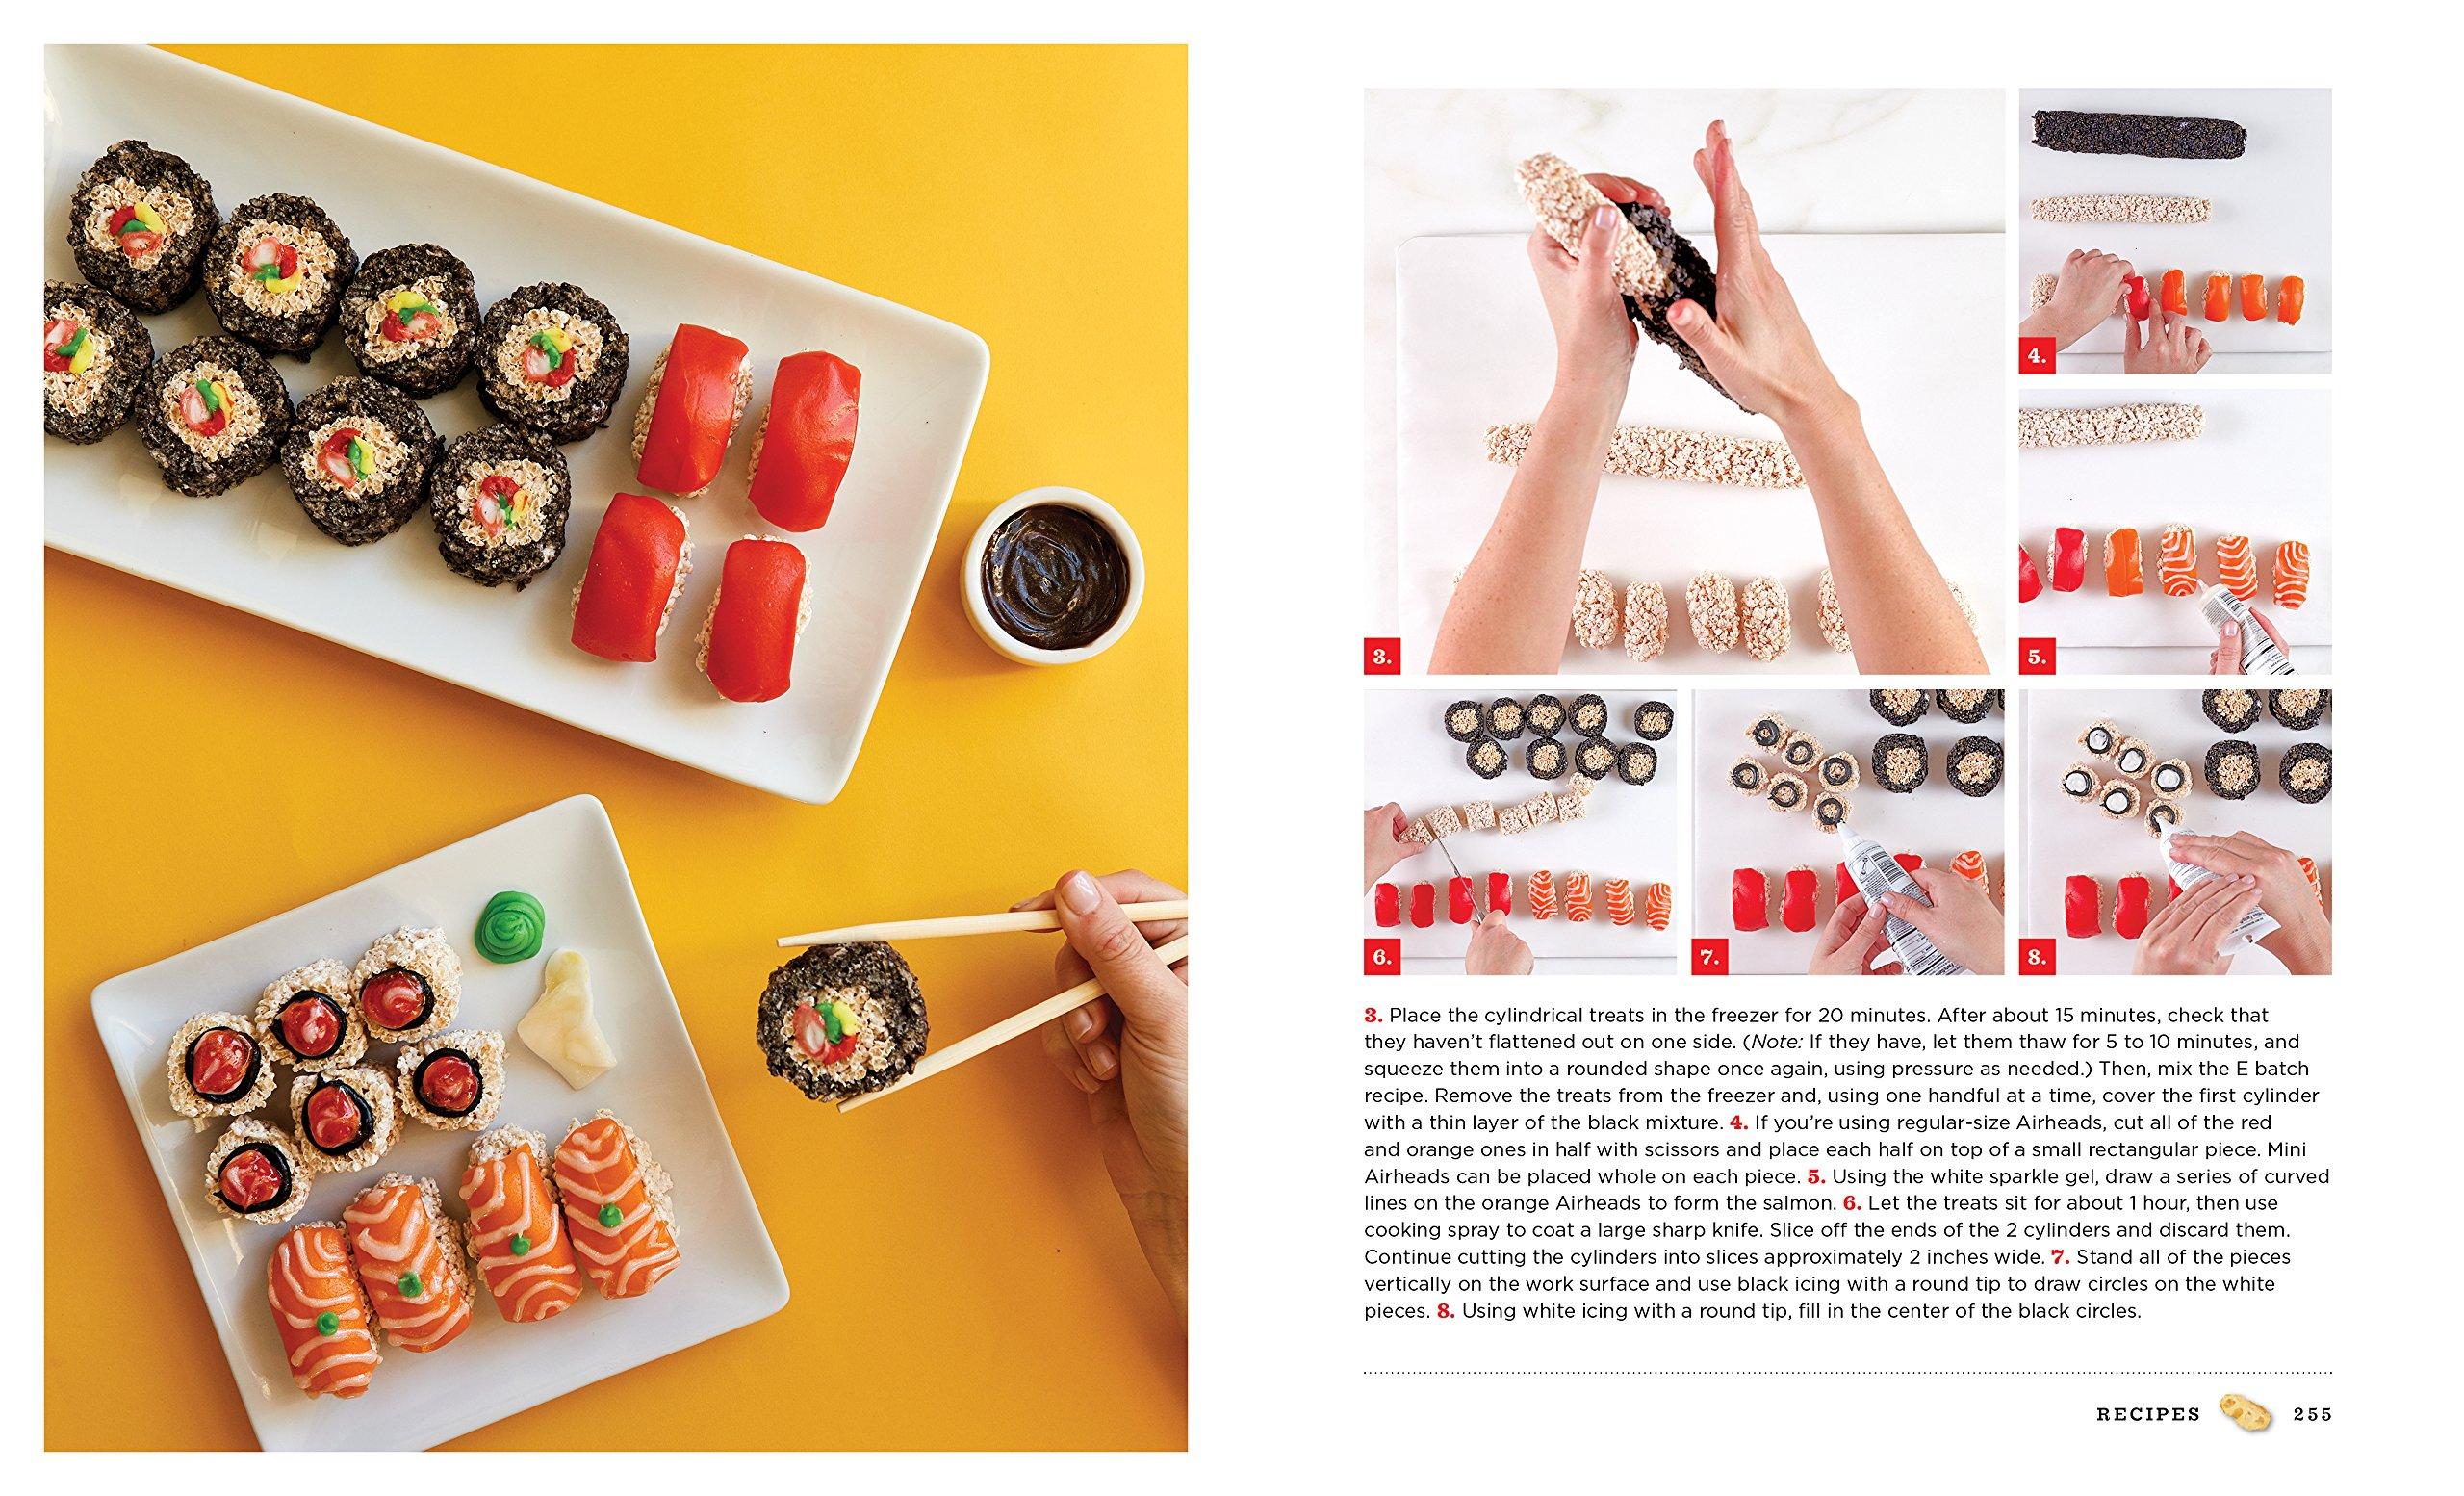 Treat Yourself!: How to Make 93 Ridiculously Fun No-Bake Crispy Rice Treats: Amazon.es: Siskin, Jessica: Libros en idiomas extranjeros